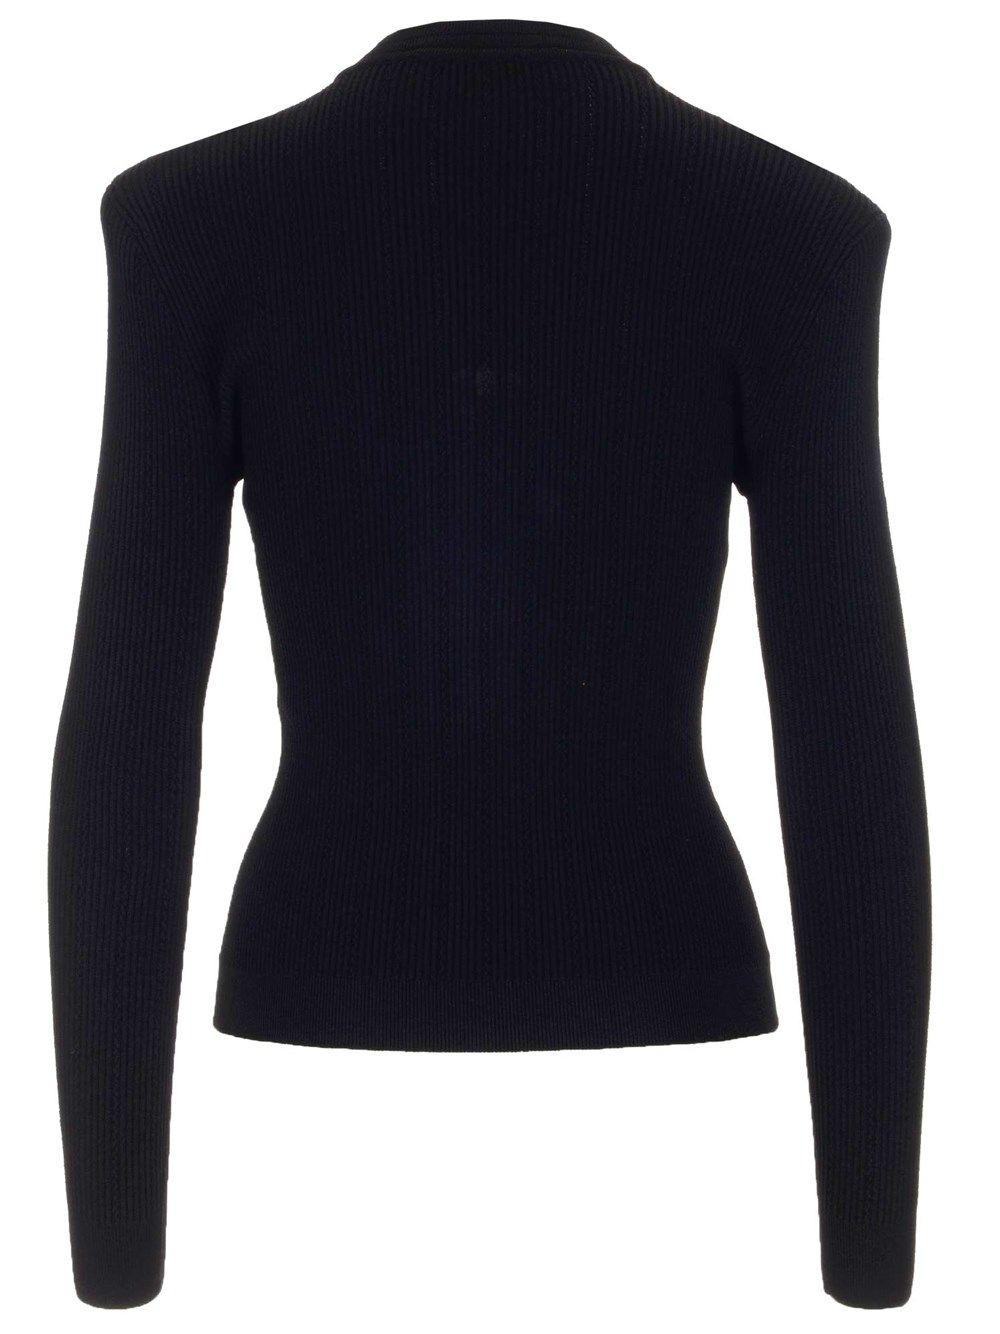 BALMAIN Jackets BALMAIN WOMEN'S BLACK OTHER MATERIALS JACKET